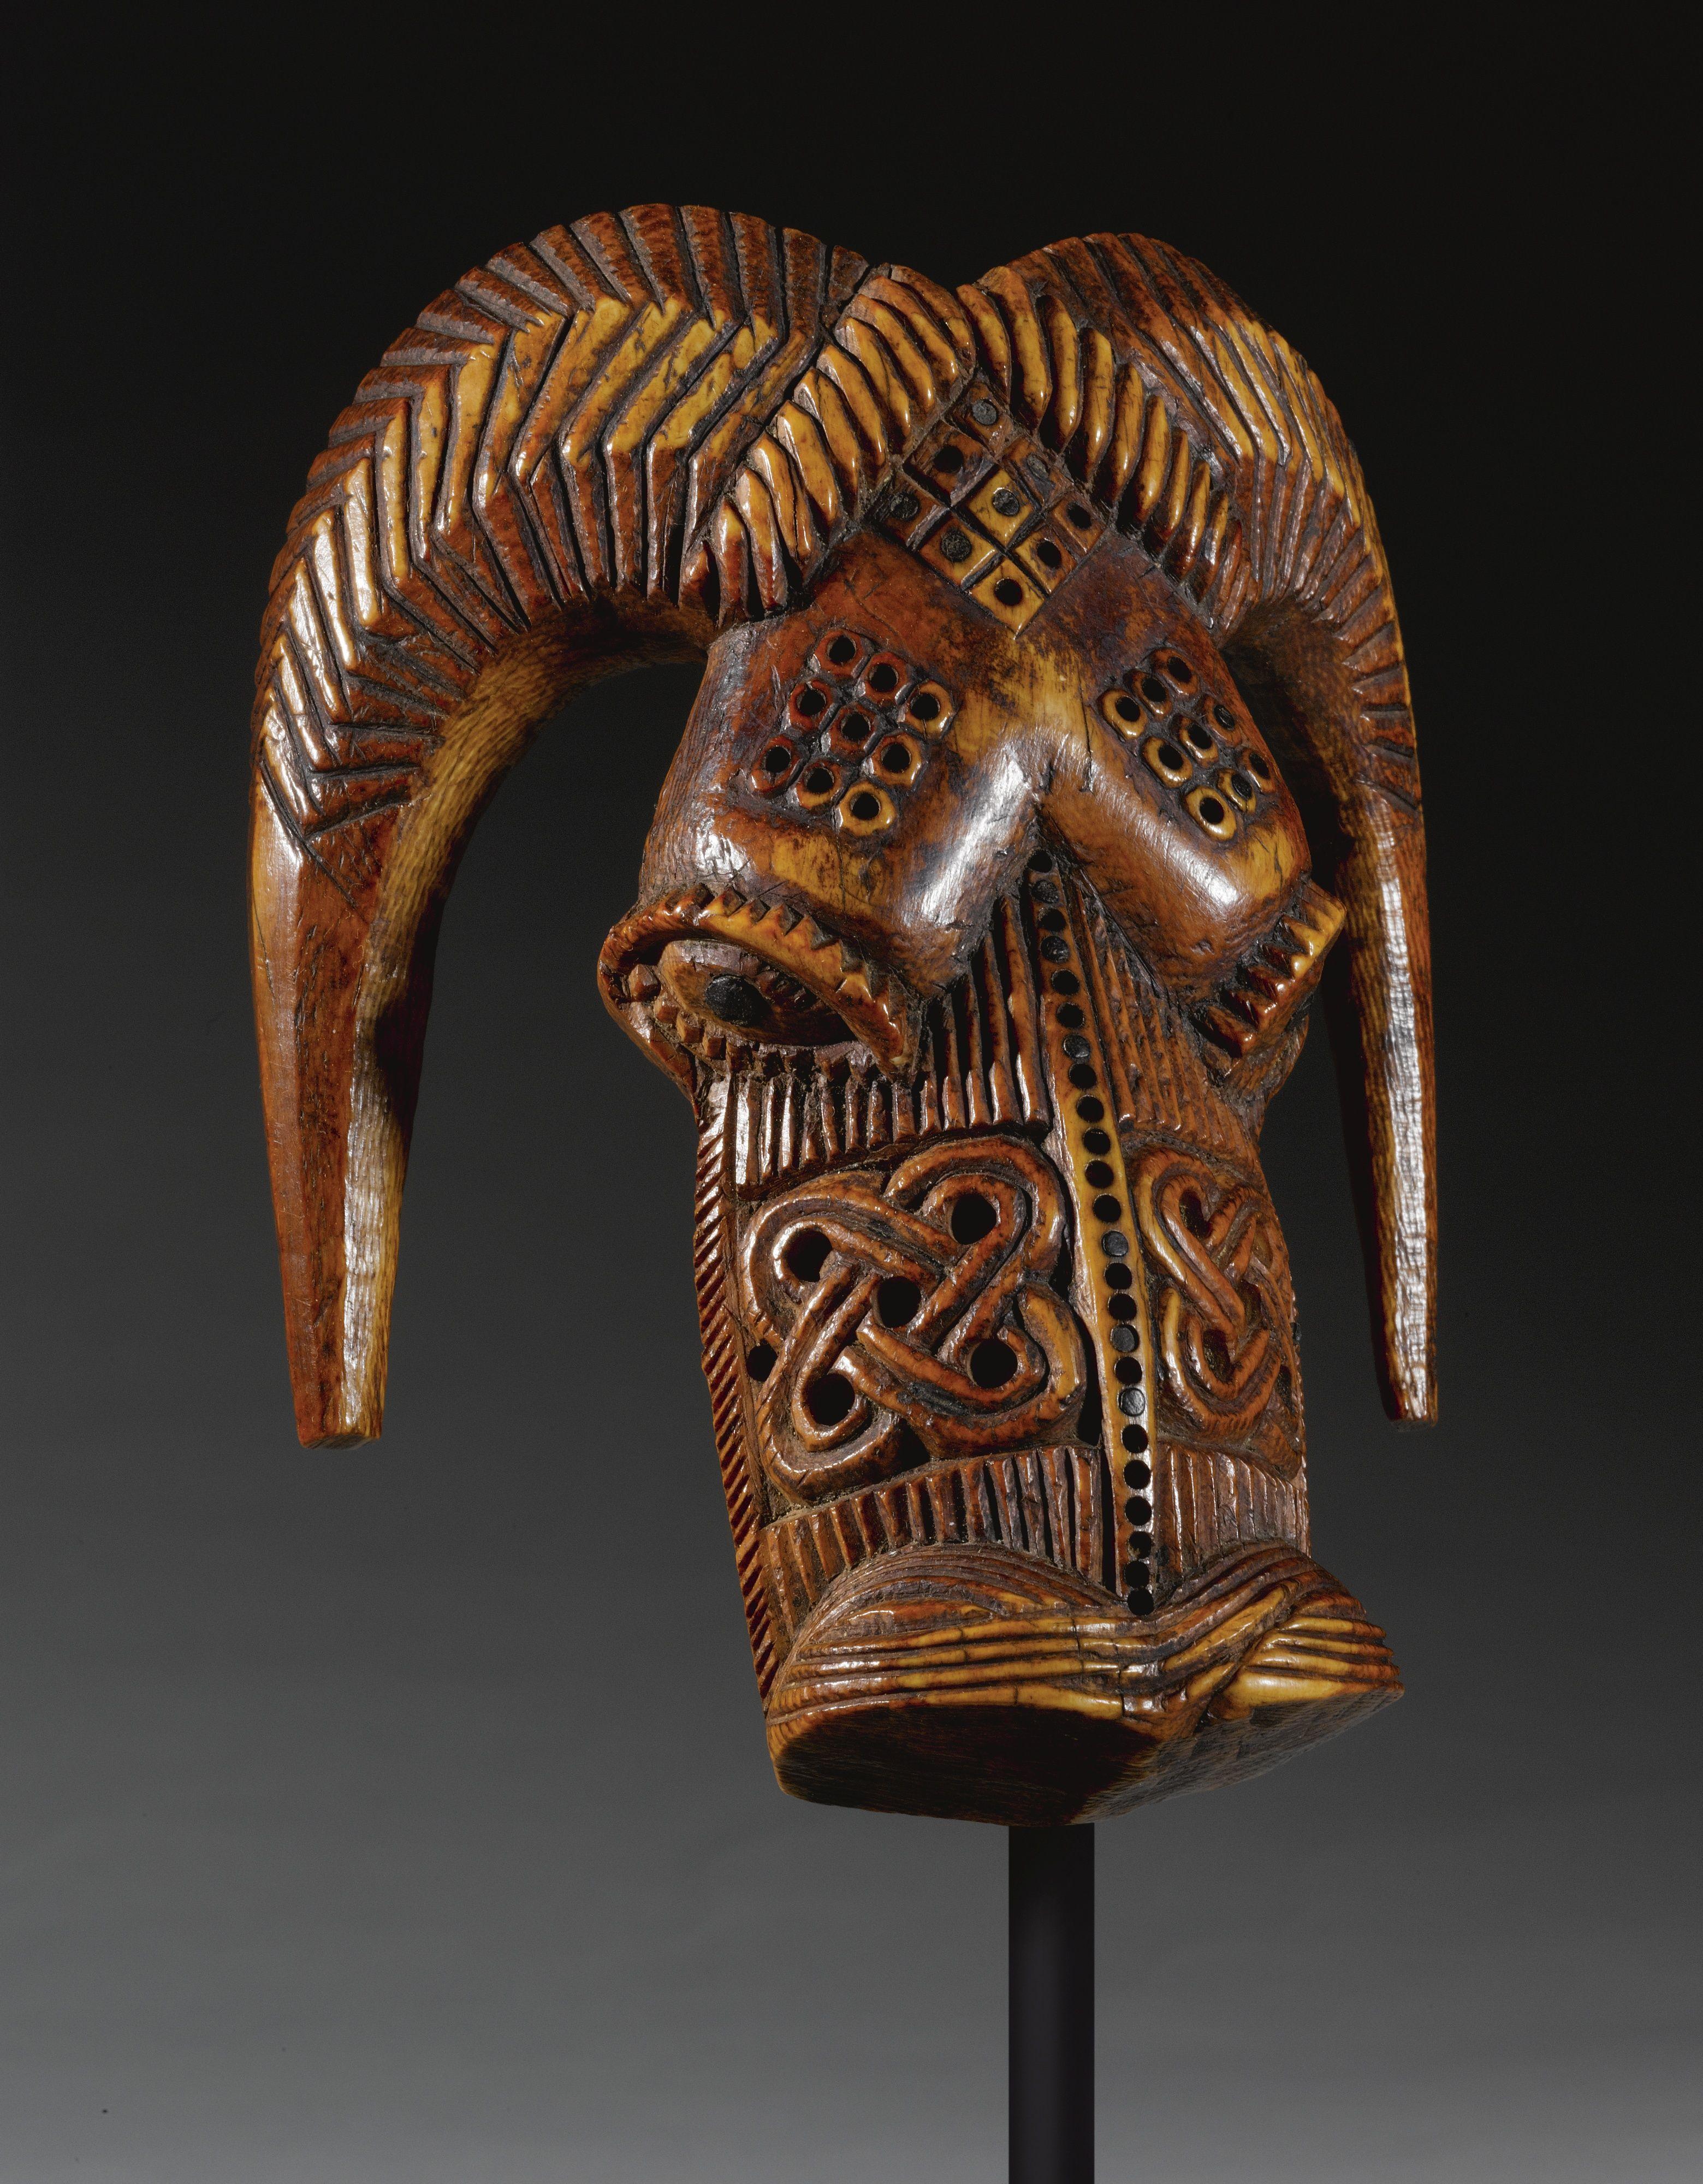 YORUBAOWO IVORY ORNAMENT NIGERIA omama made of African Elephant